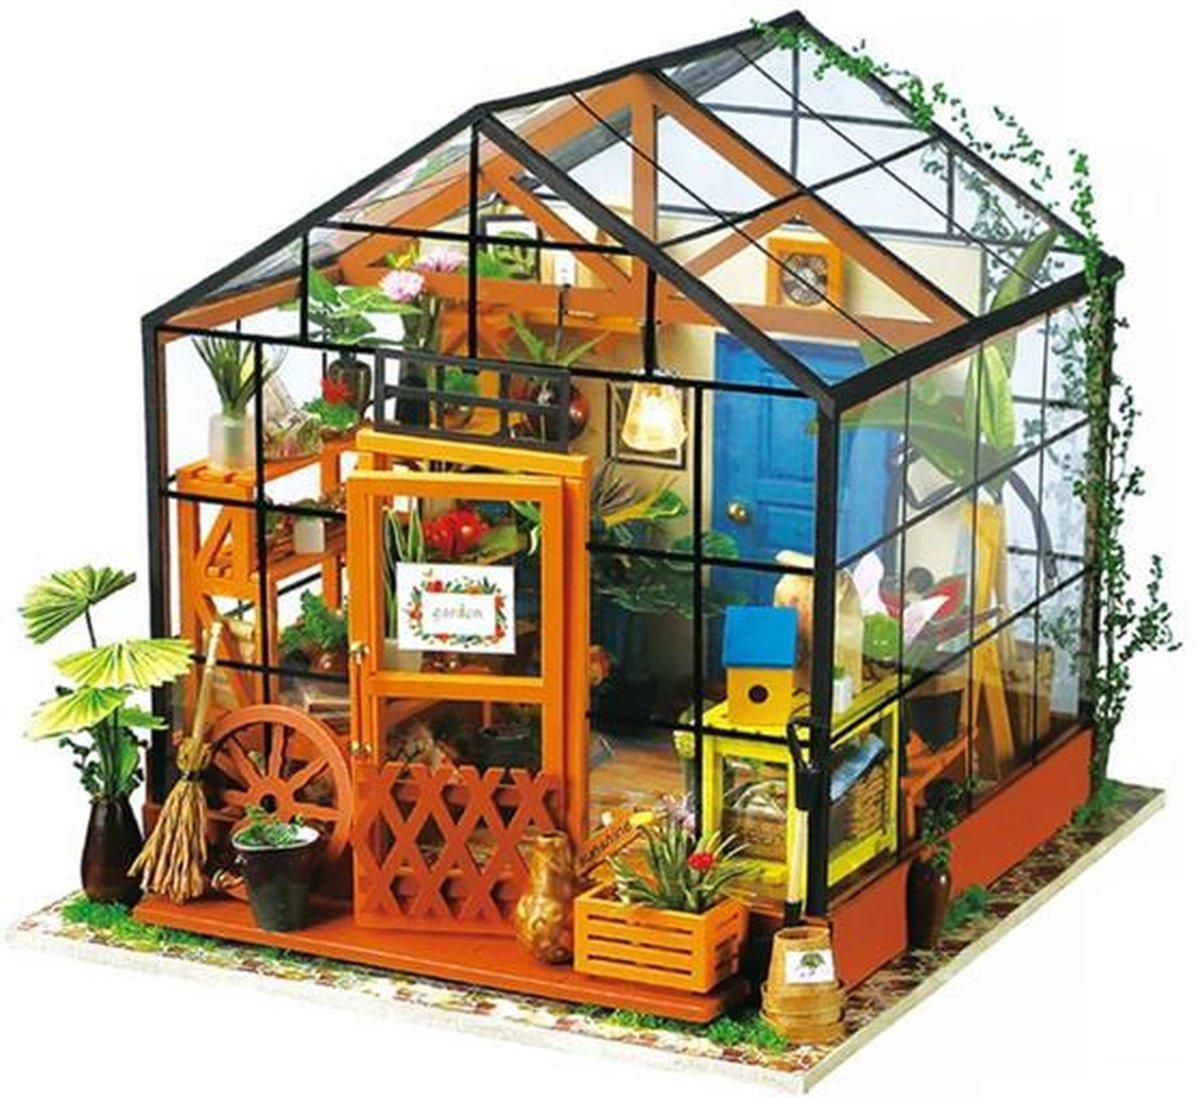 Robotime modelbouwpakket - Cathy's Flower House